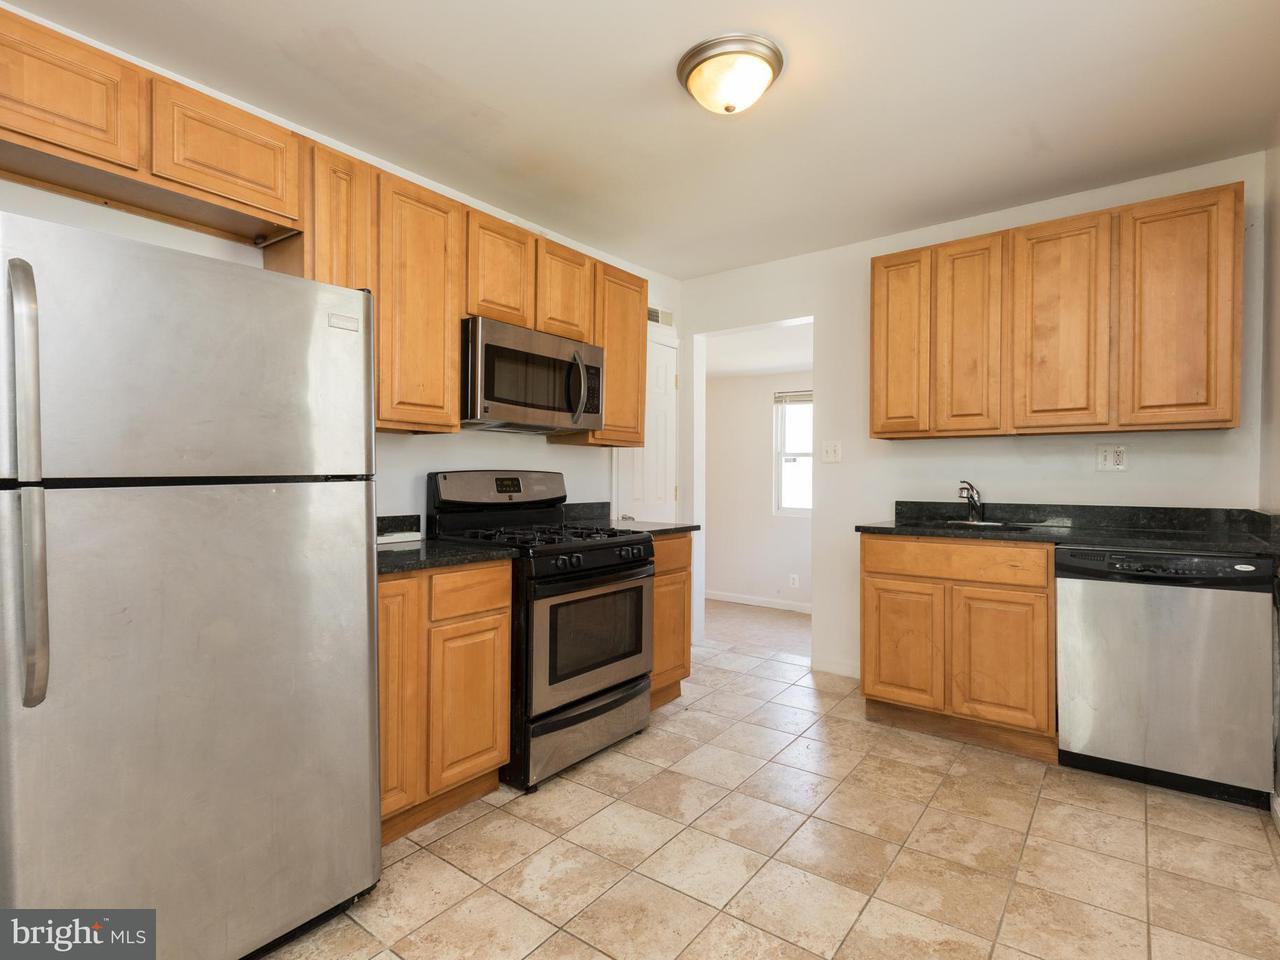 Single Family for Sale at 6517 Woodland Rd Morningside, Maryland 20746 United States